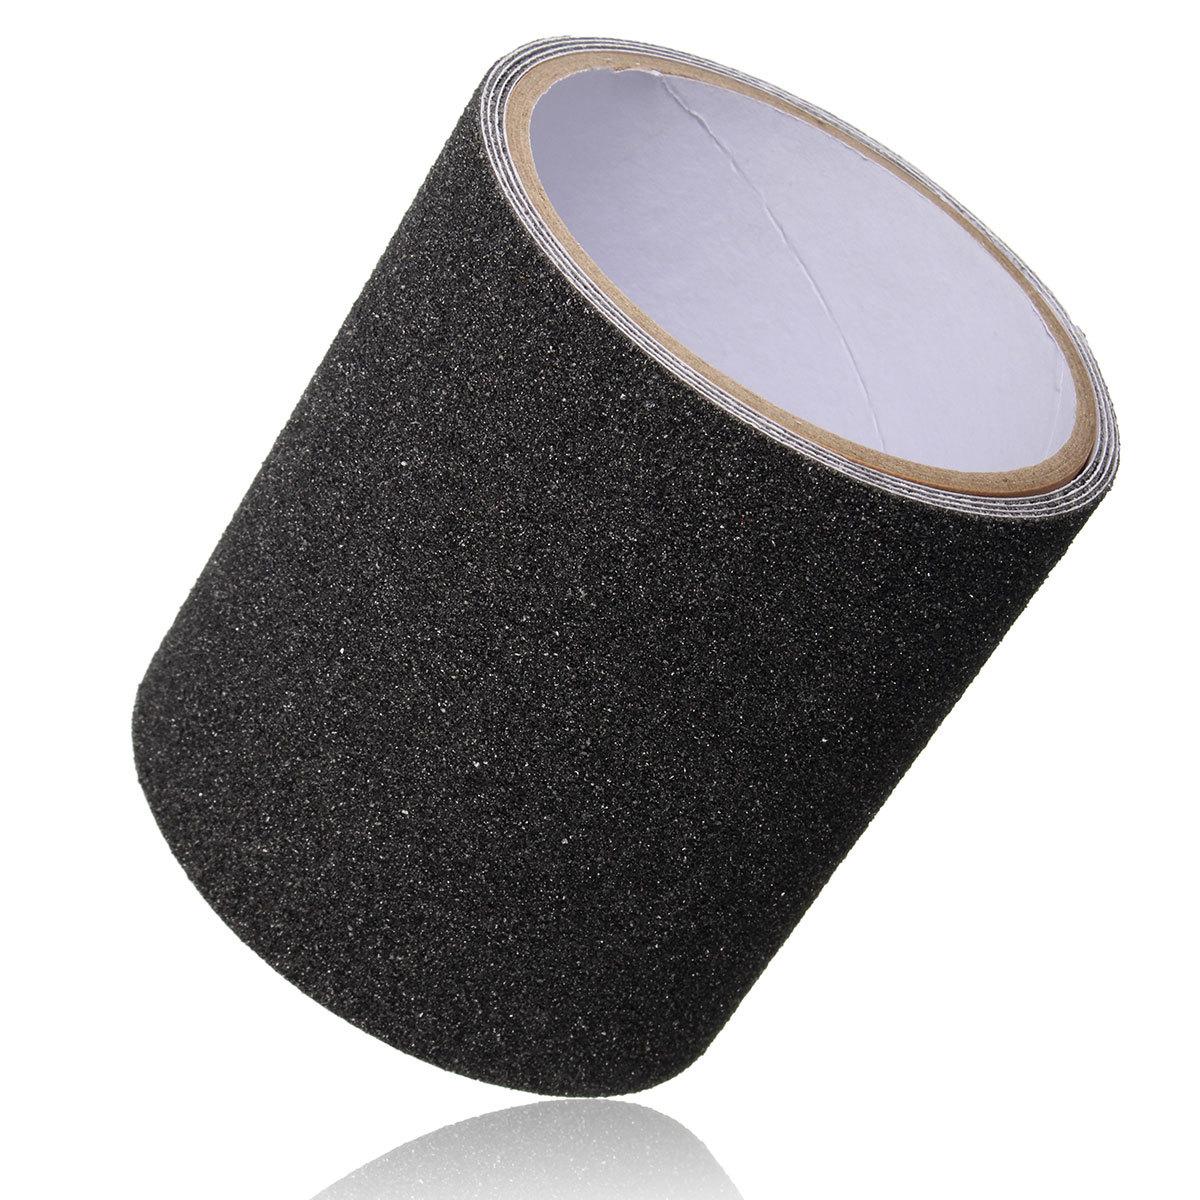 Anti Slip Floor Safety Grooving : M cm roll stair floor safety non skid tape anti slip